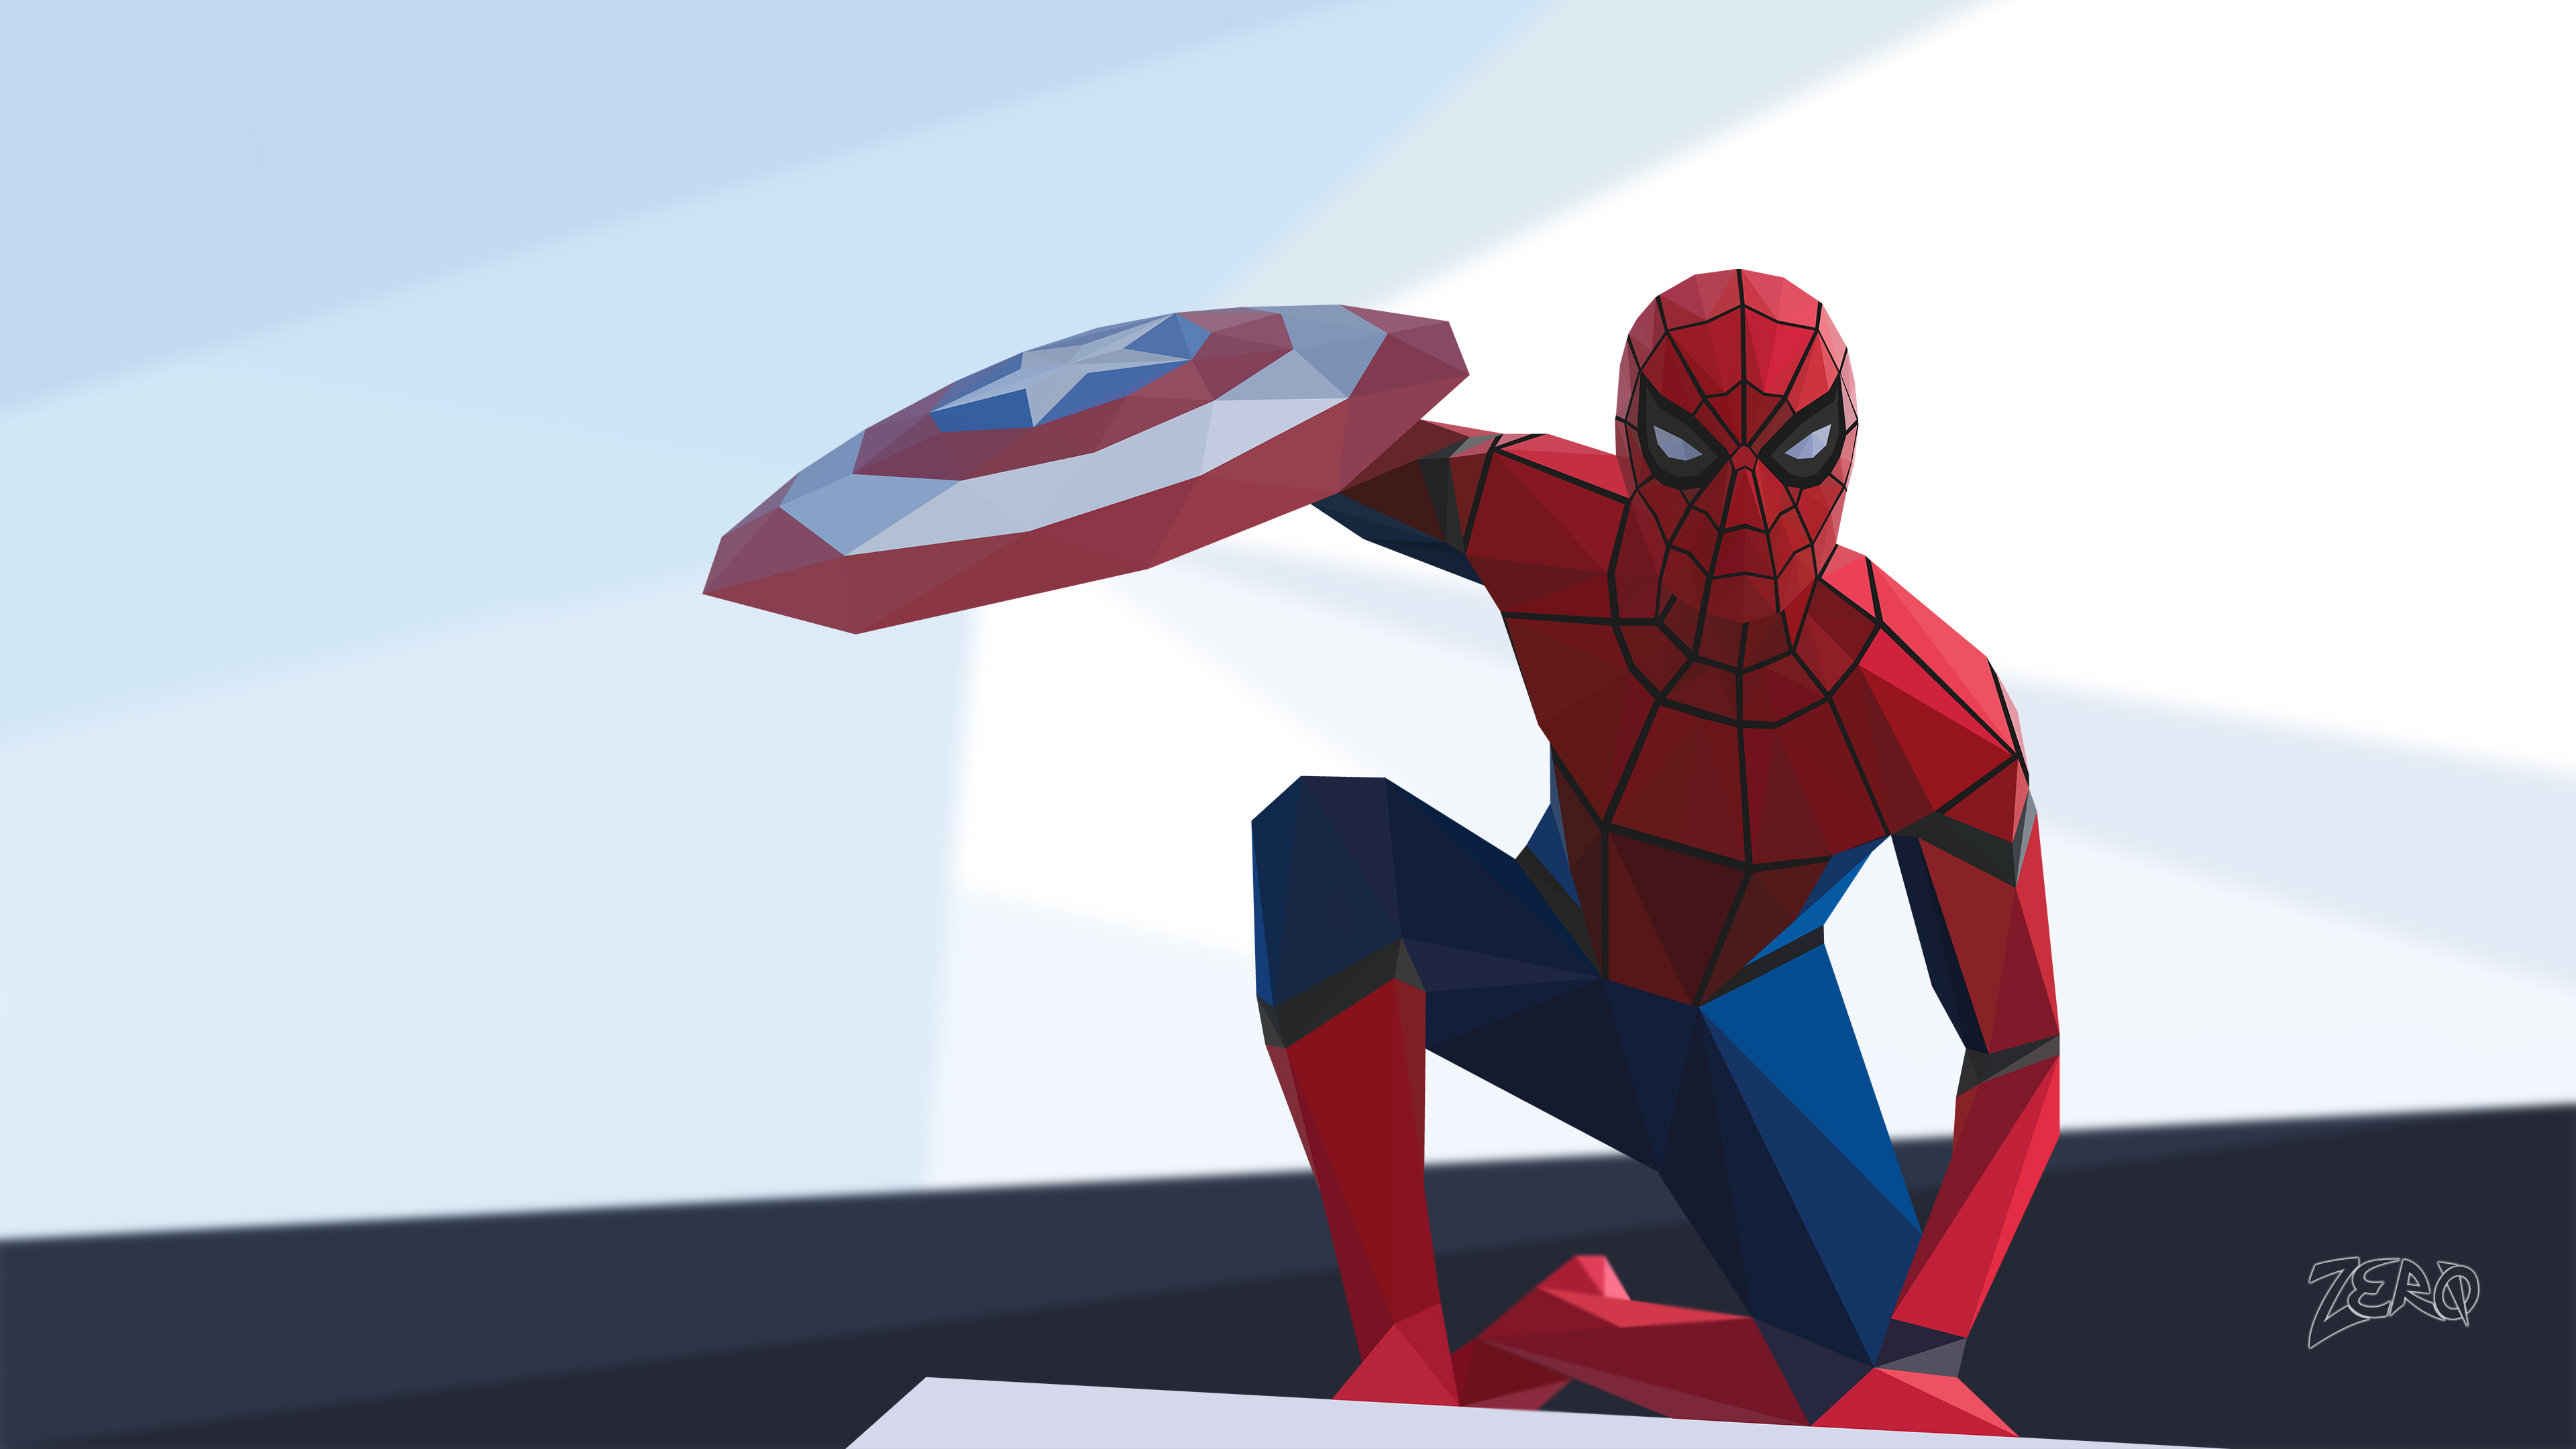 spiderman civil war low poly 4k 1539978584 - Spiderman Civil War Low Poly 4k - superheroes wallpapers, spiderman wallpapers, hd-wallpapers, digital art wallpapers, deviantart wallpapers, artwork wallpapers, artist wallpapers, 4k-wallpapers